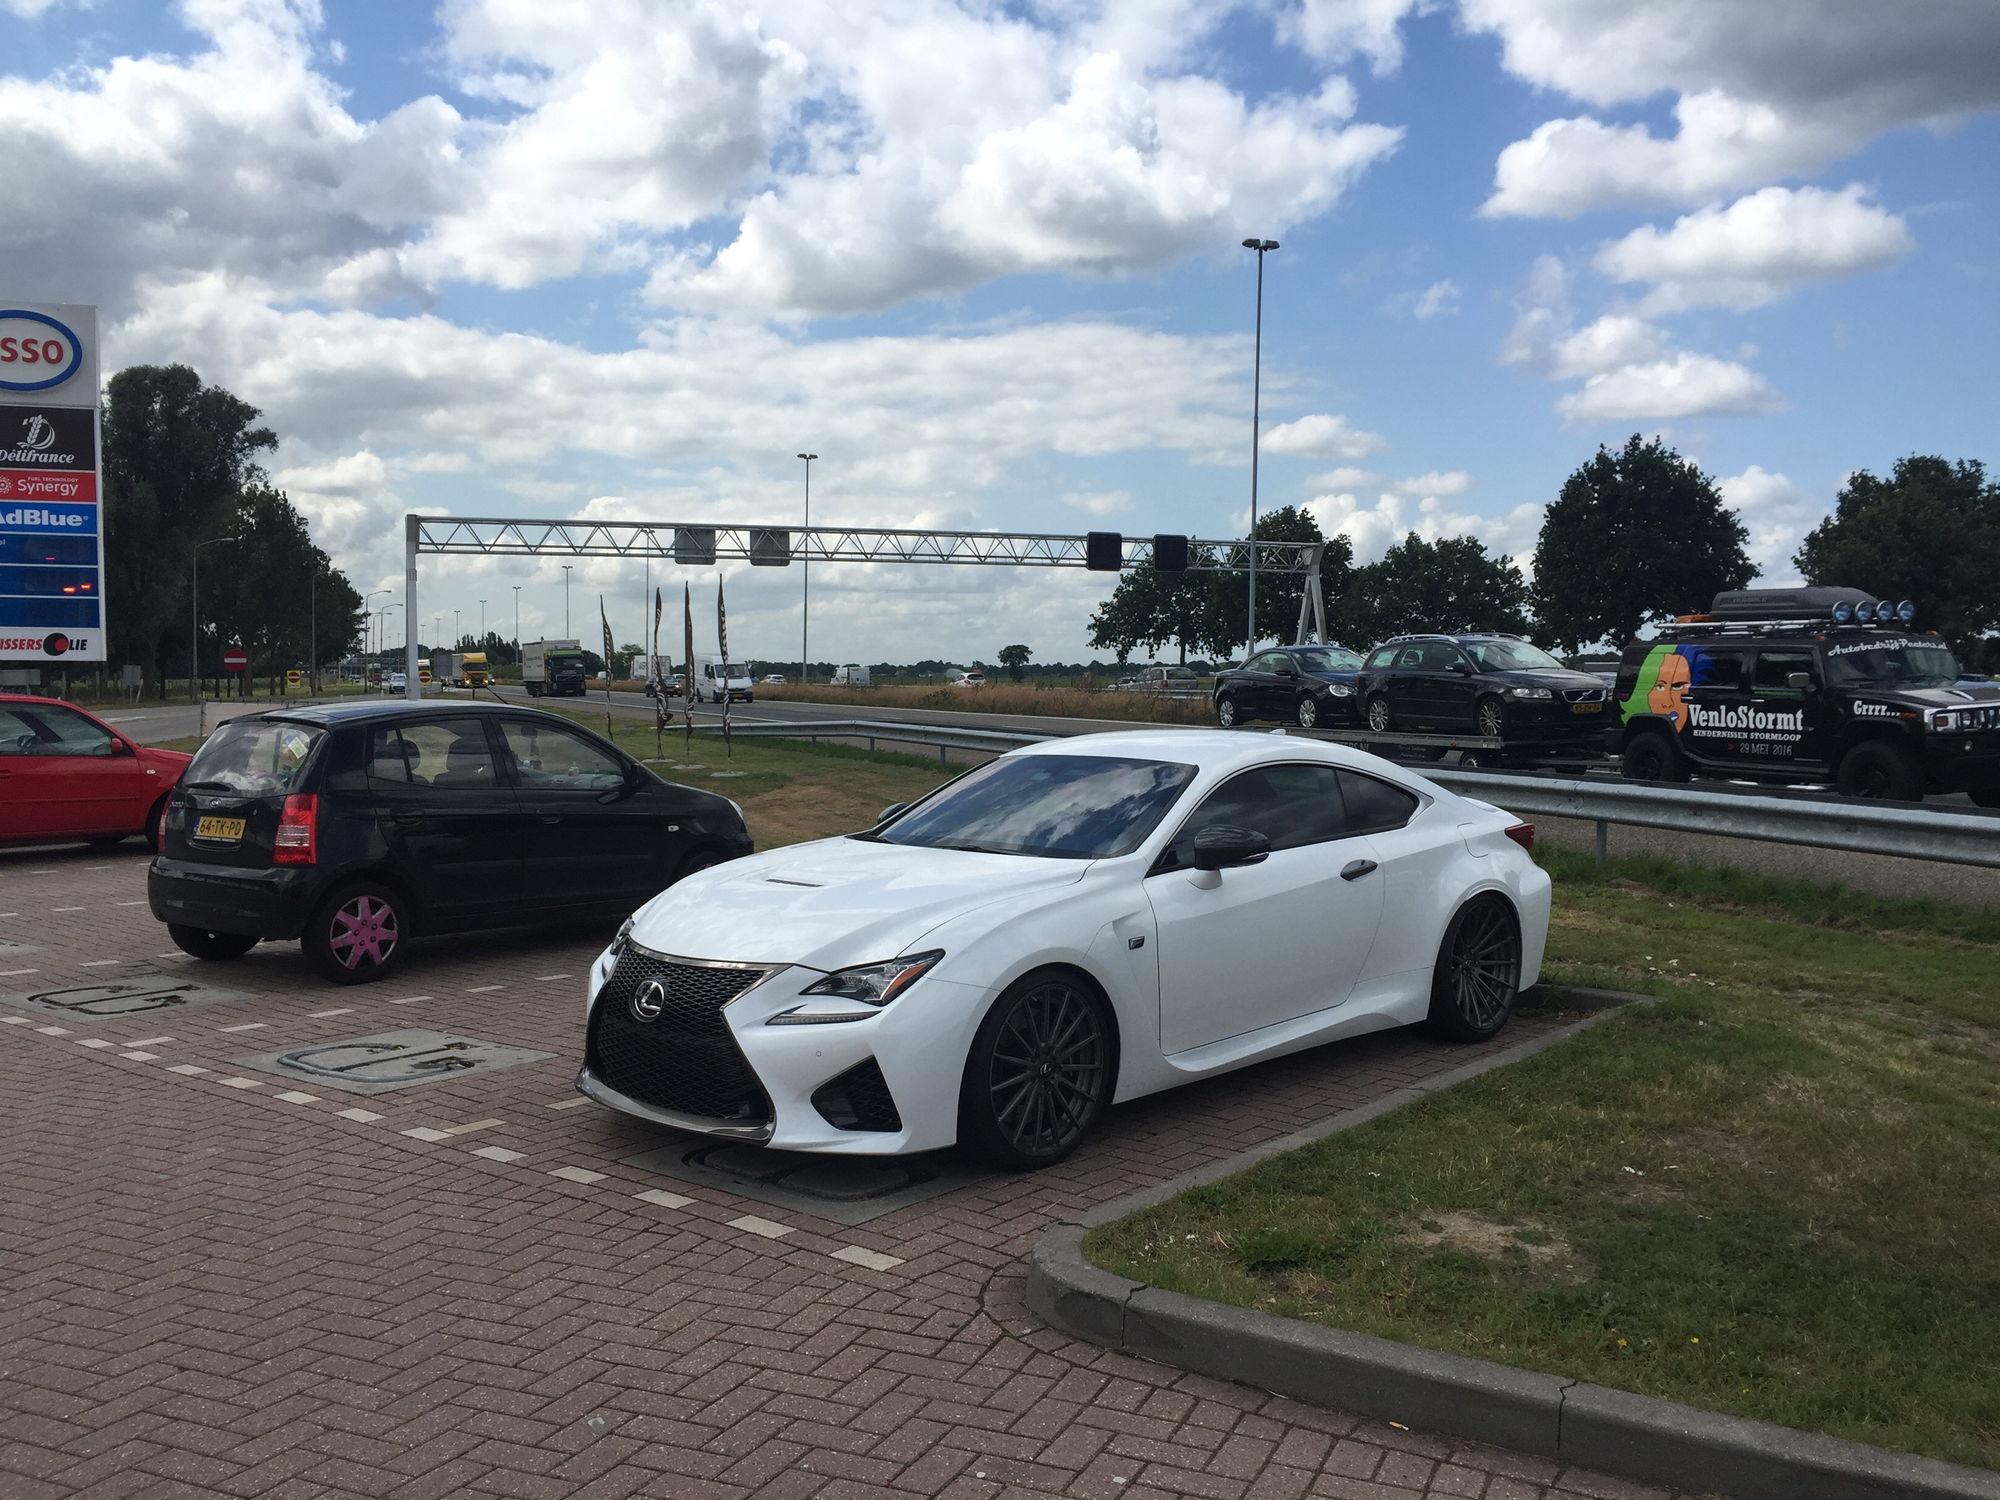 Lexus RC-F world trip - ClubLexus - Lexus Forum Discussion